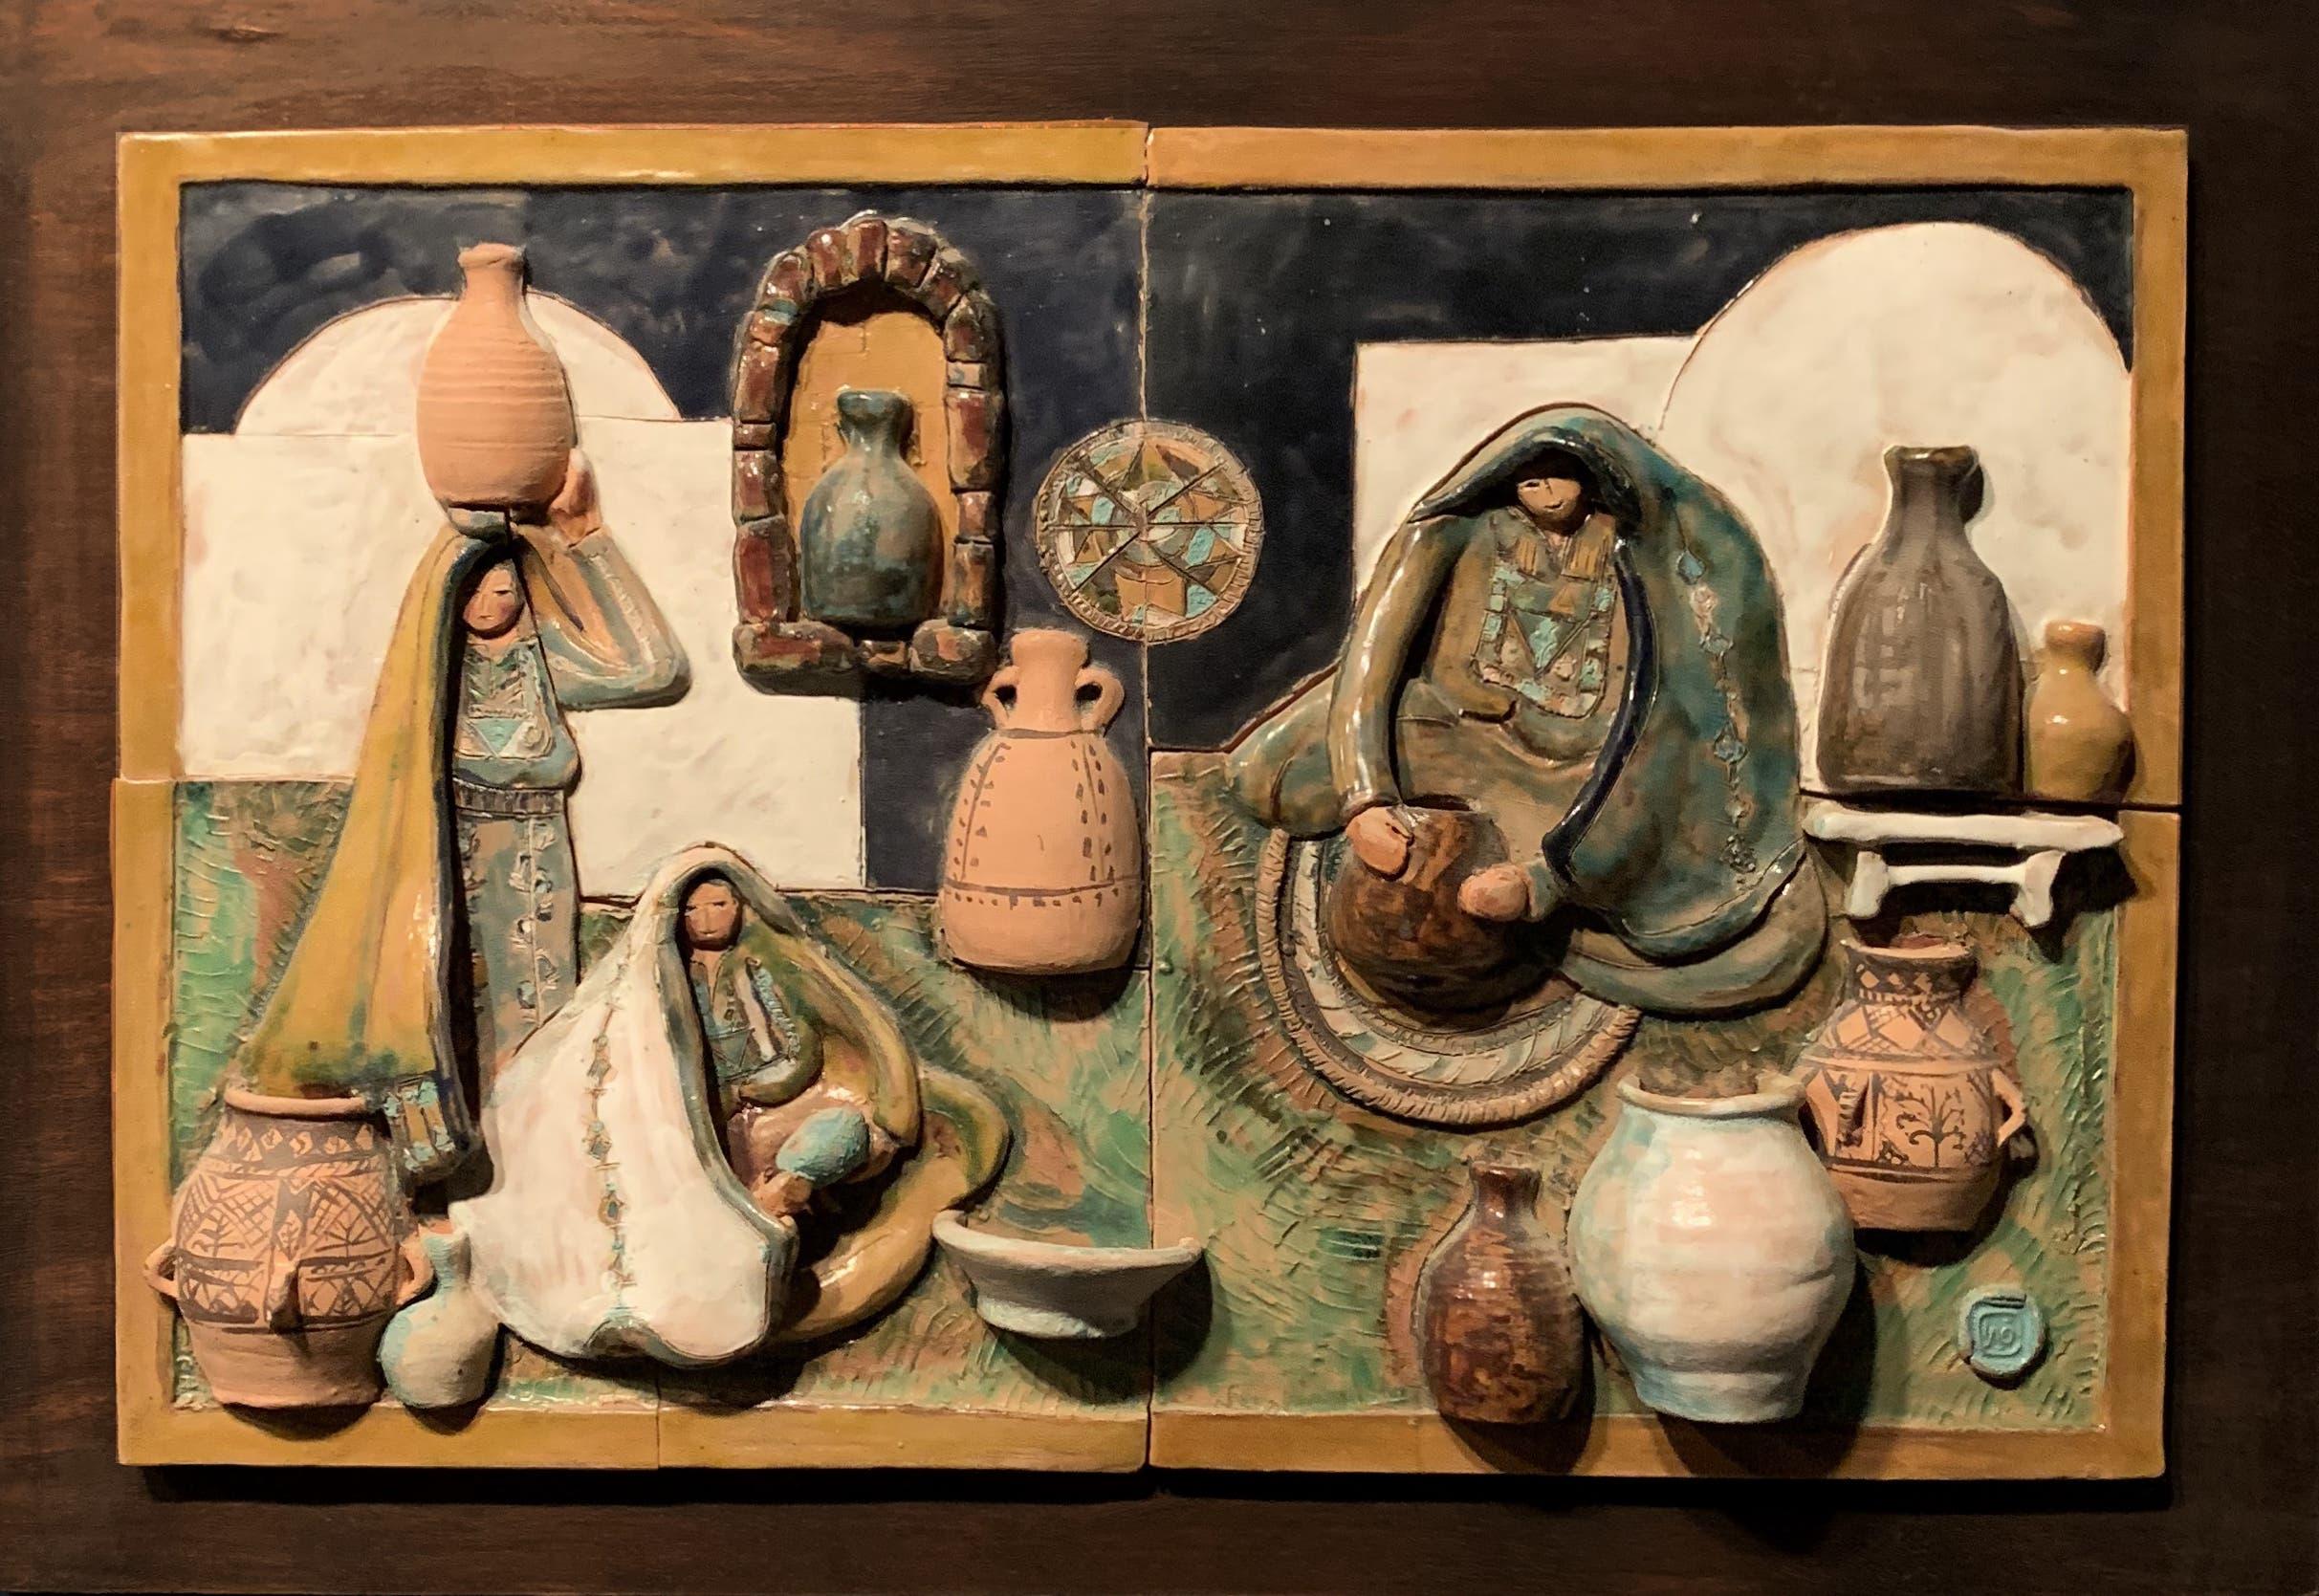 Vera Tamari, Palestinian Women at Work, 1979, Ceramic relief. (Image courtesy of Barjeel Art Foundation, Sharjah.)